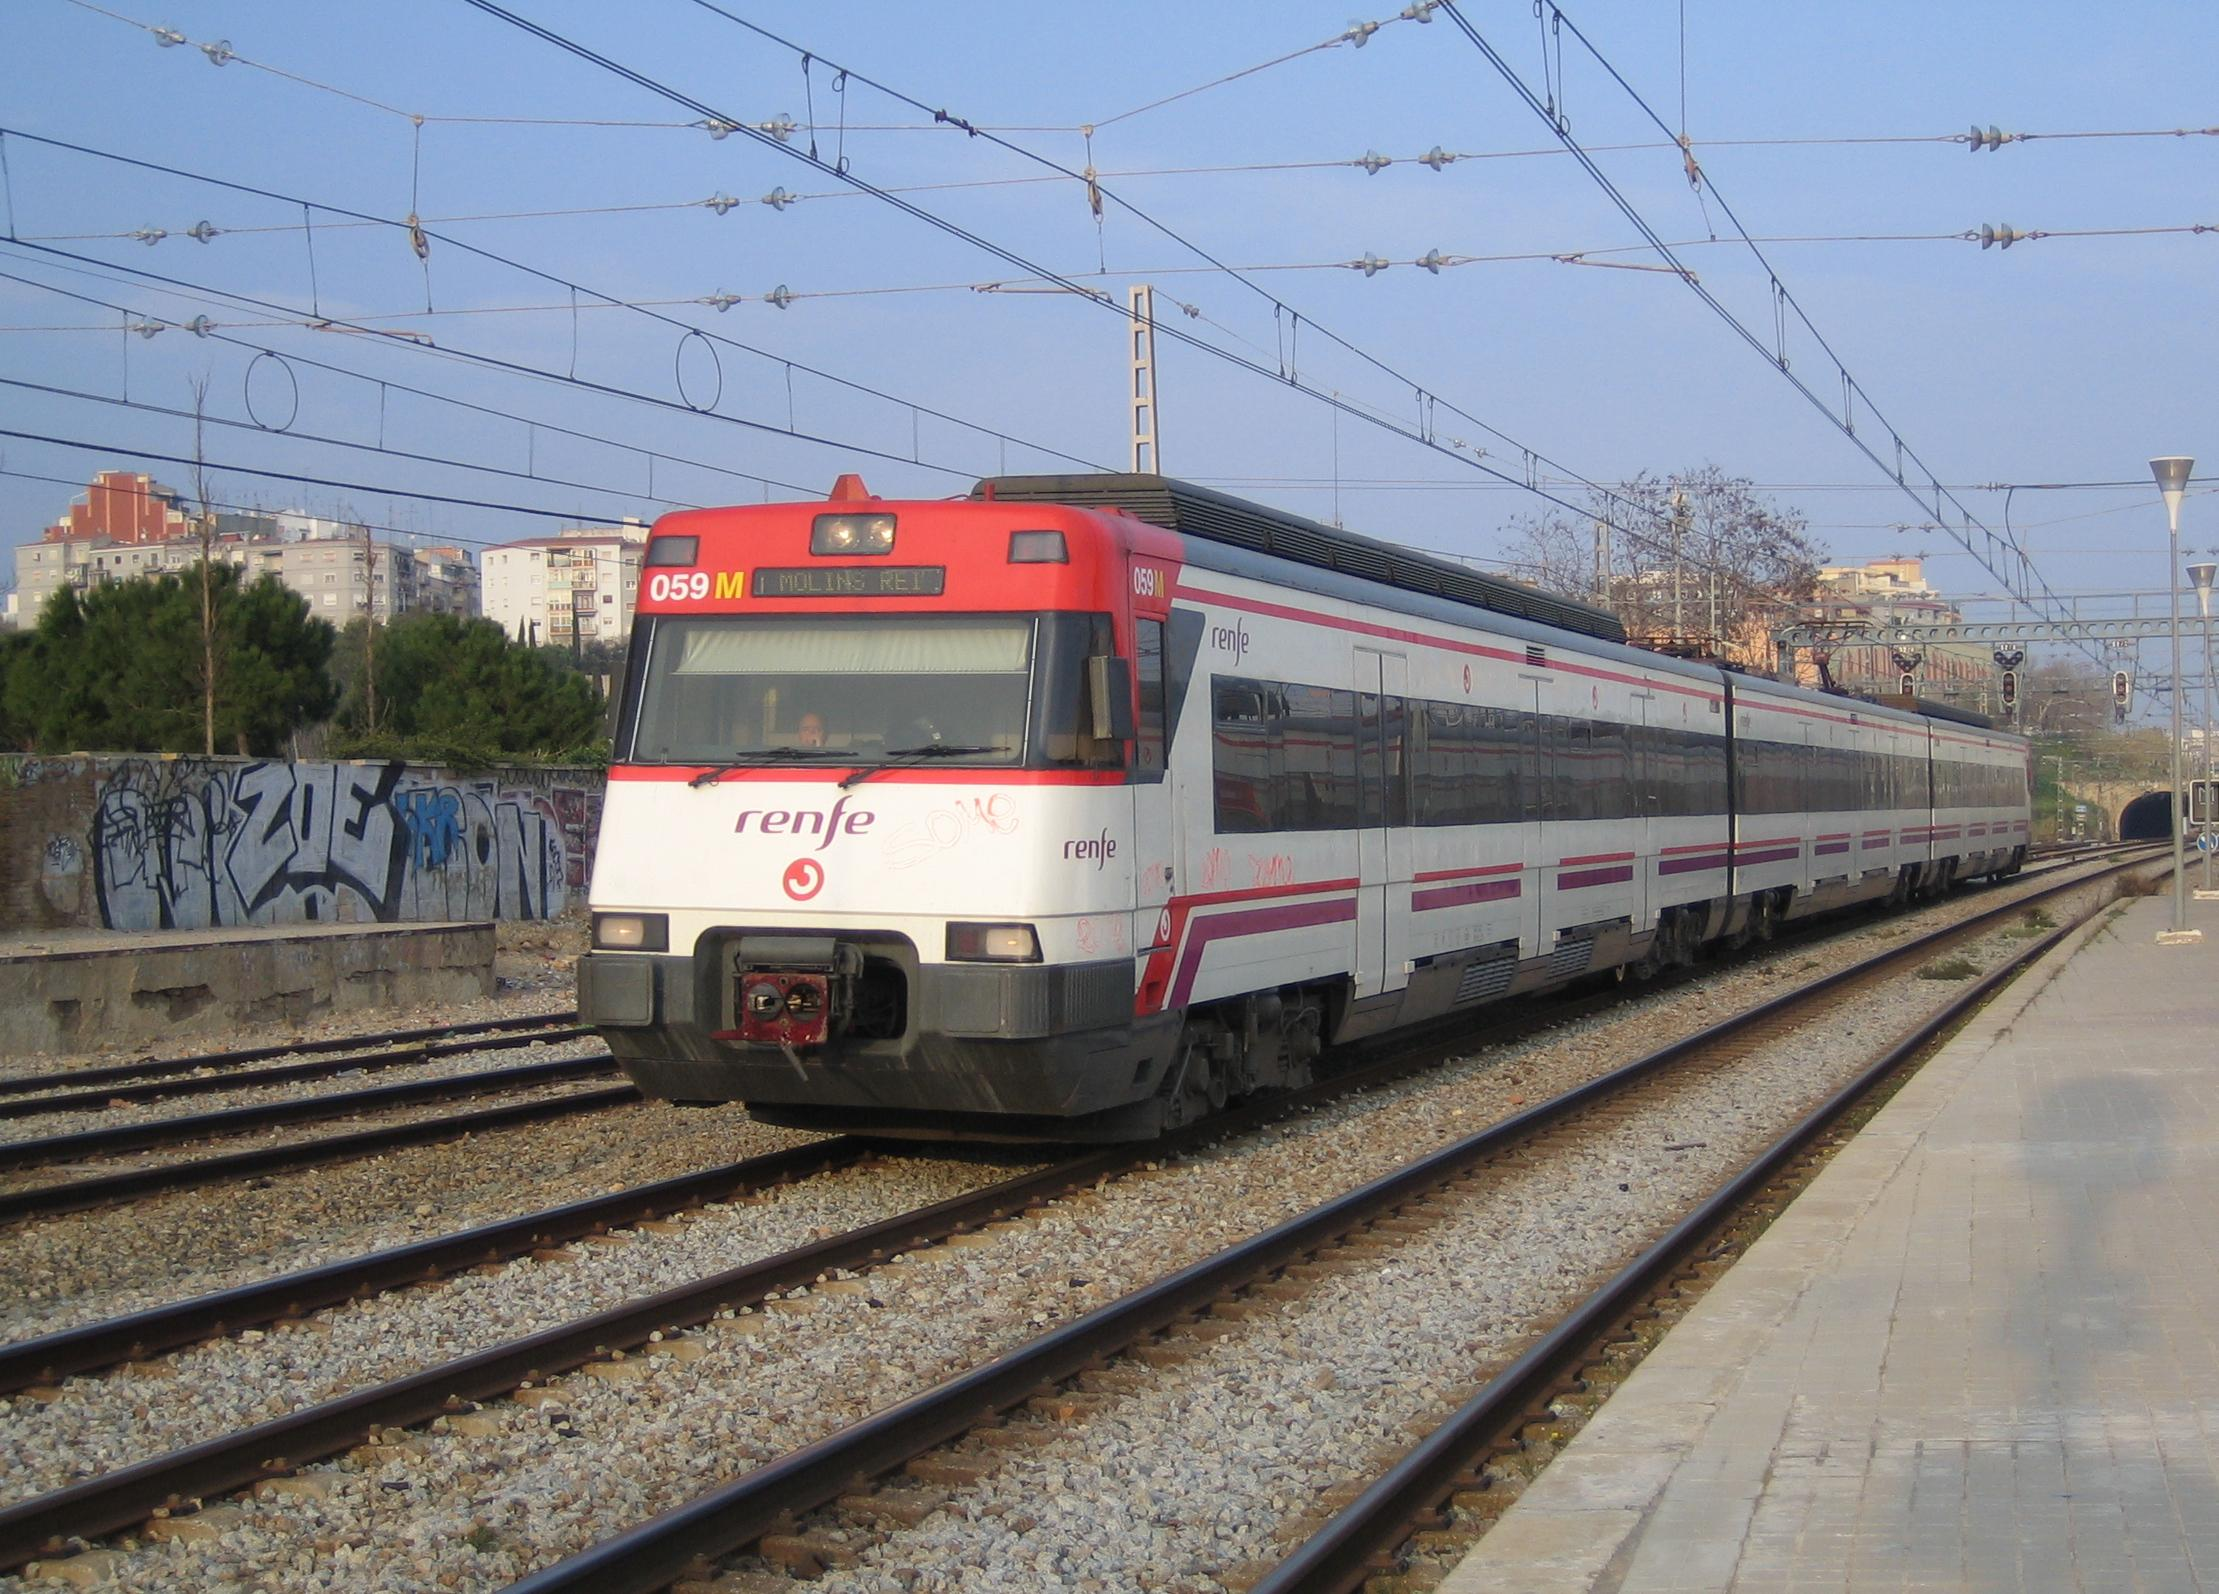 Station L Hospitalet De Llobregat Wikipedia